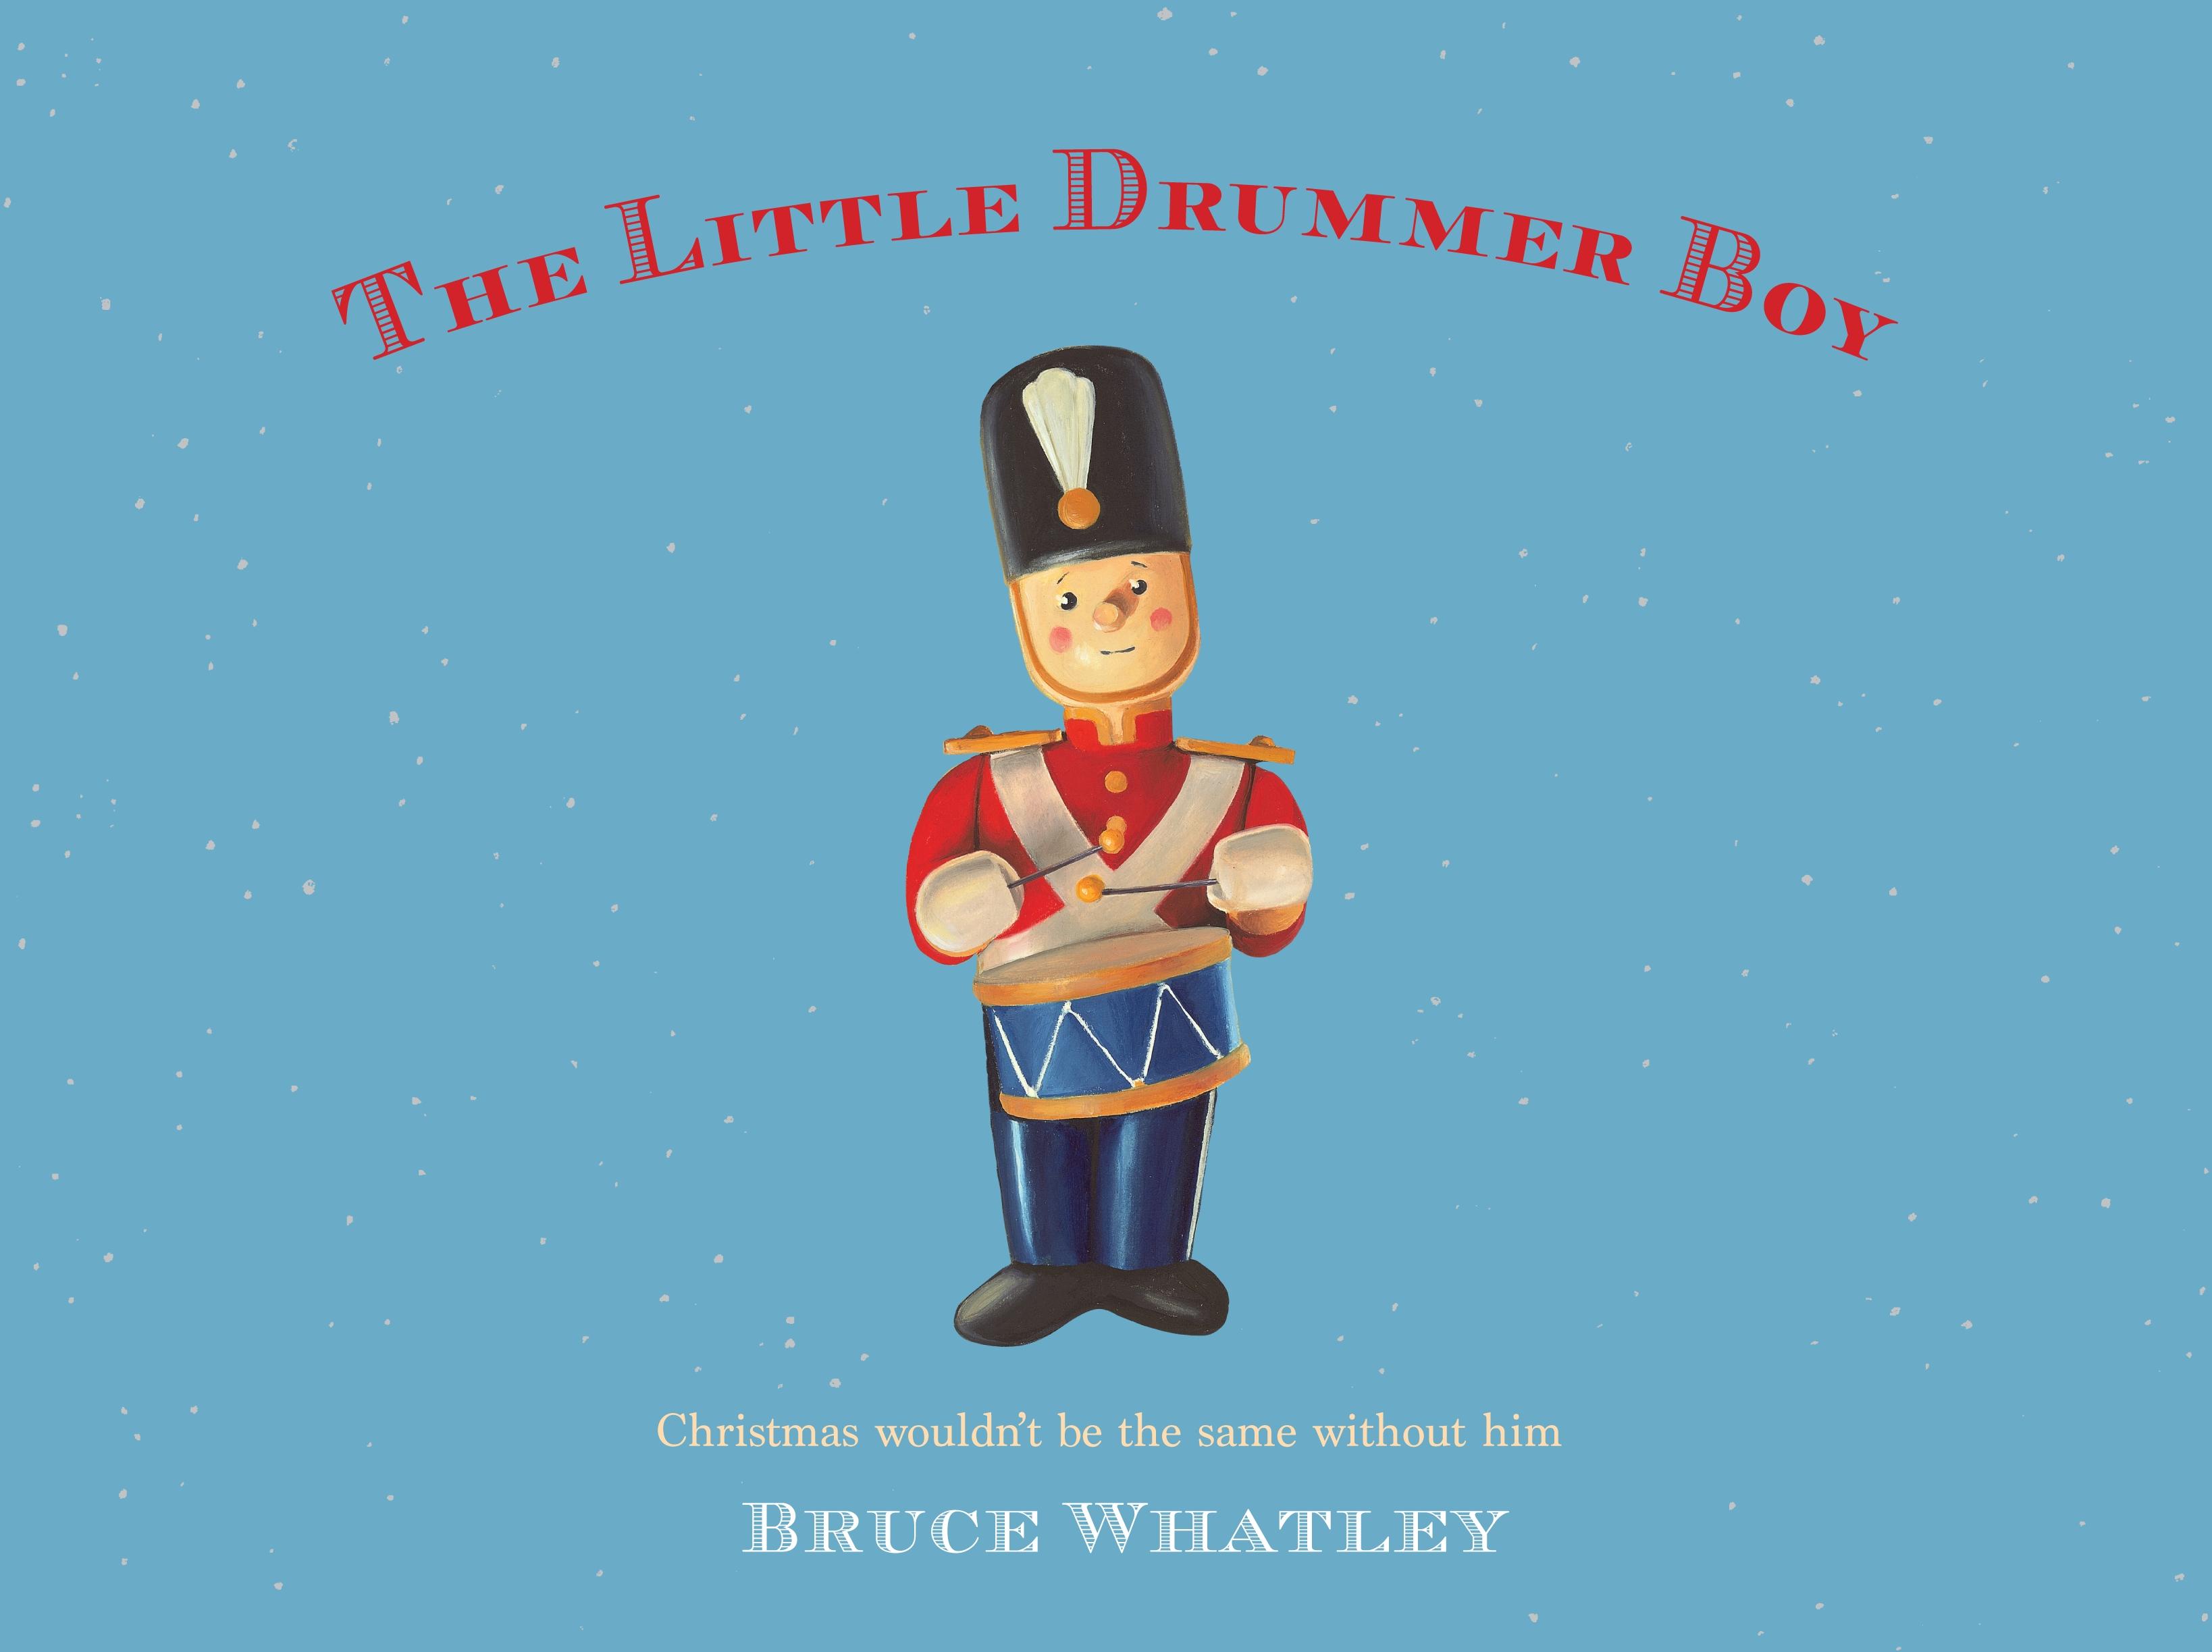 Christmas Drummer Boy.The Little Drummer Boy By Bruce Whatley Penguin Books